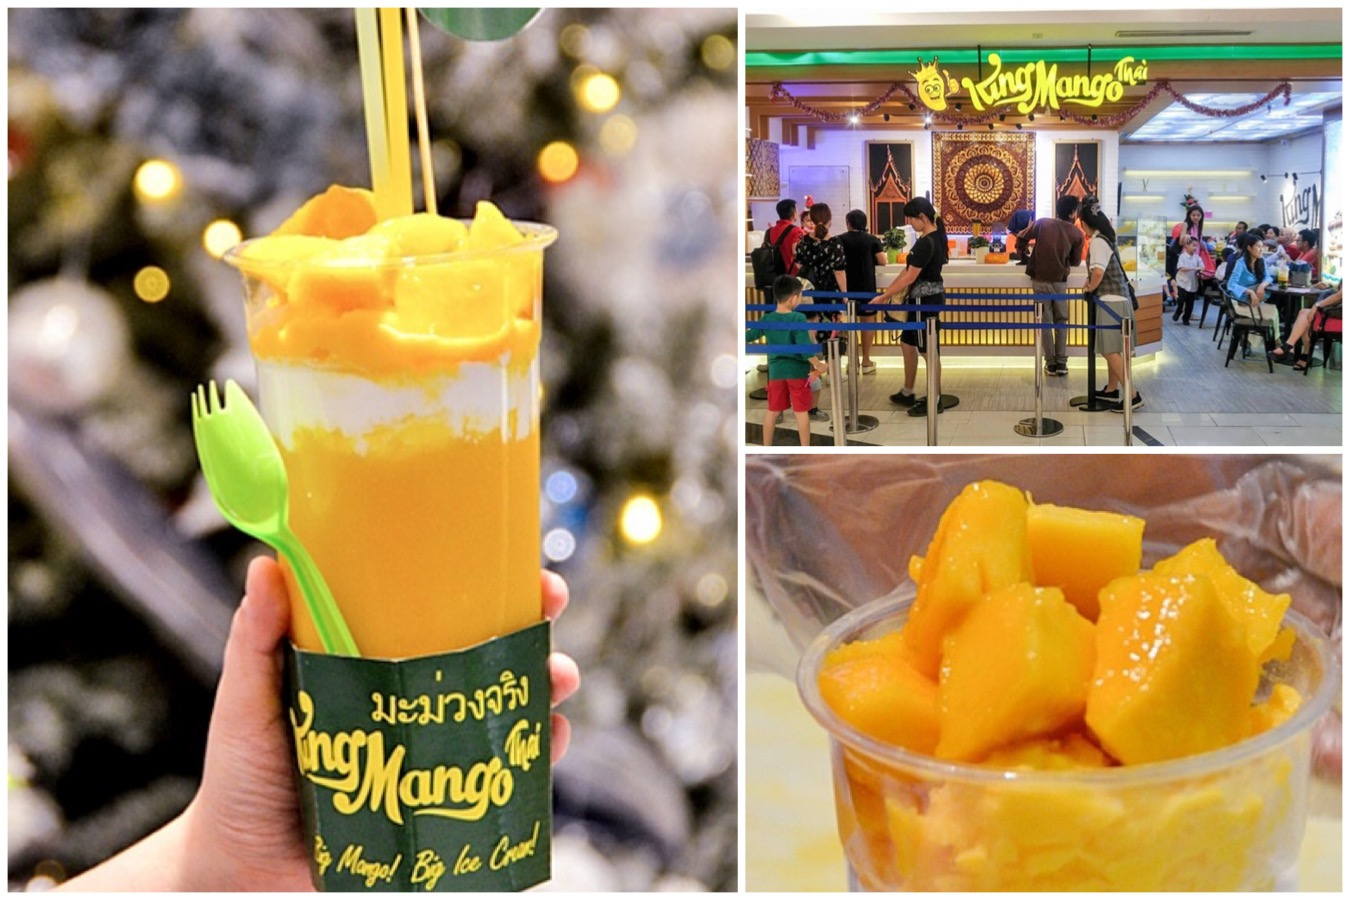 King Mango Thai Mango Puree Dessert at Neo SOHO Central Park Jakarta Indonesia.